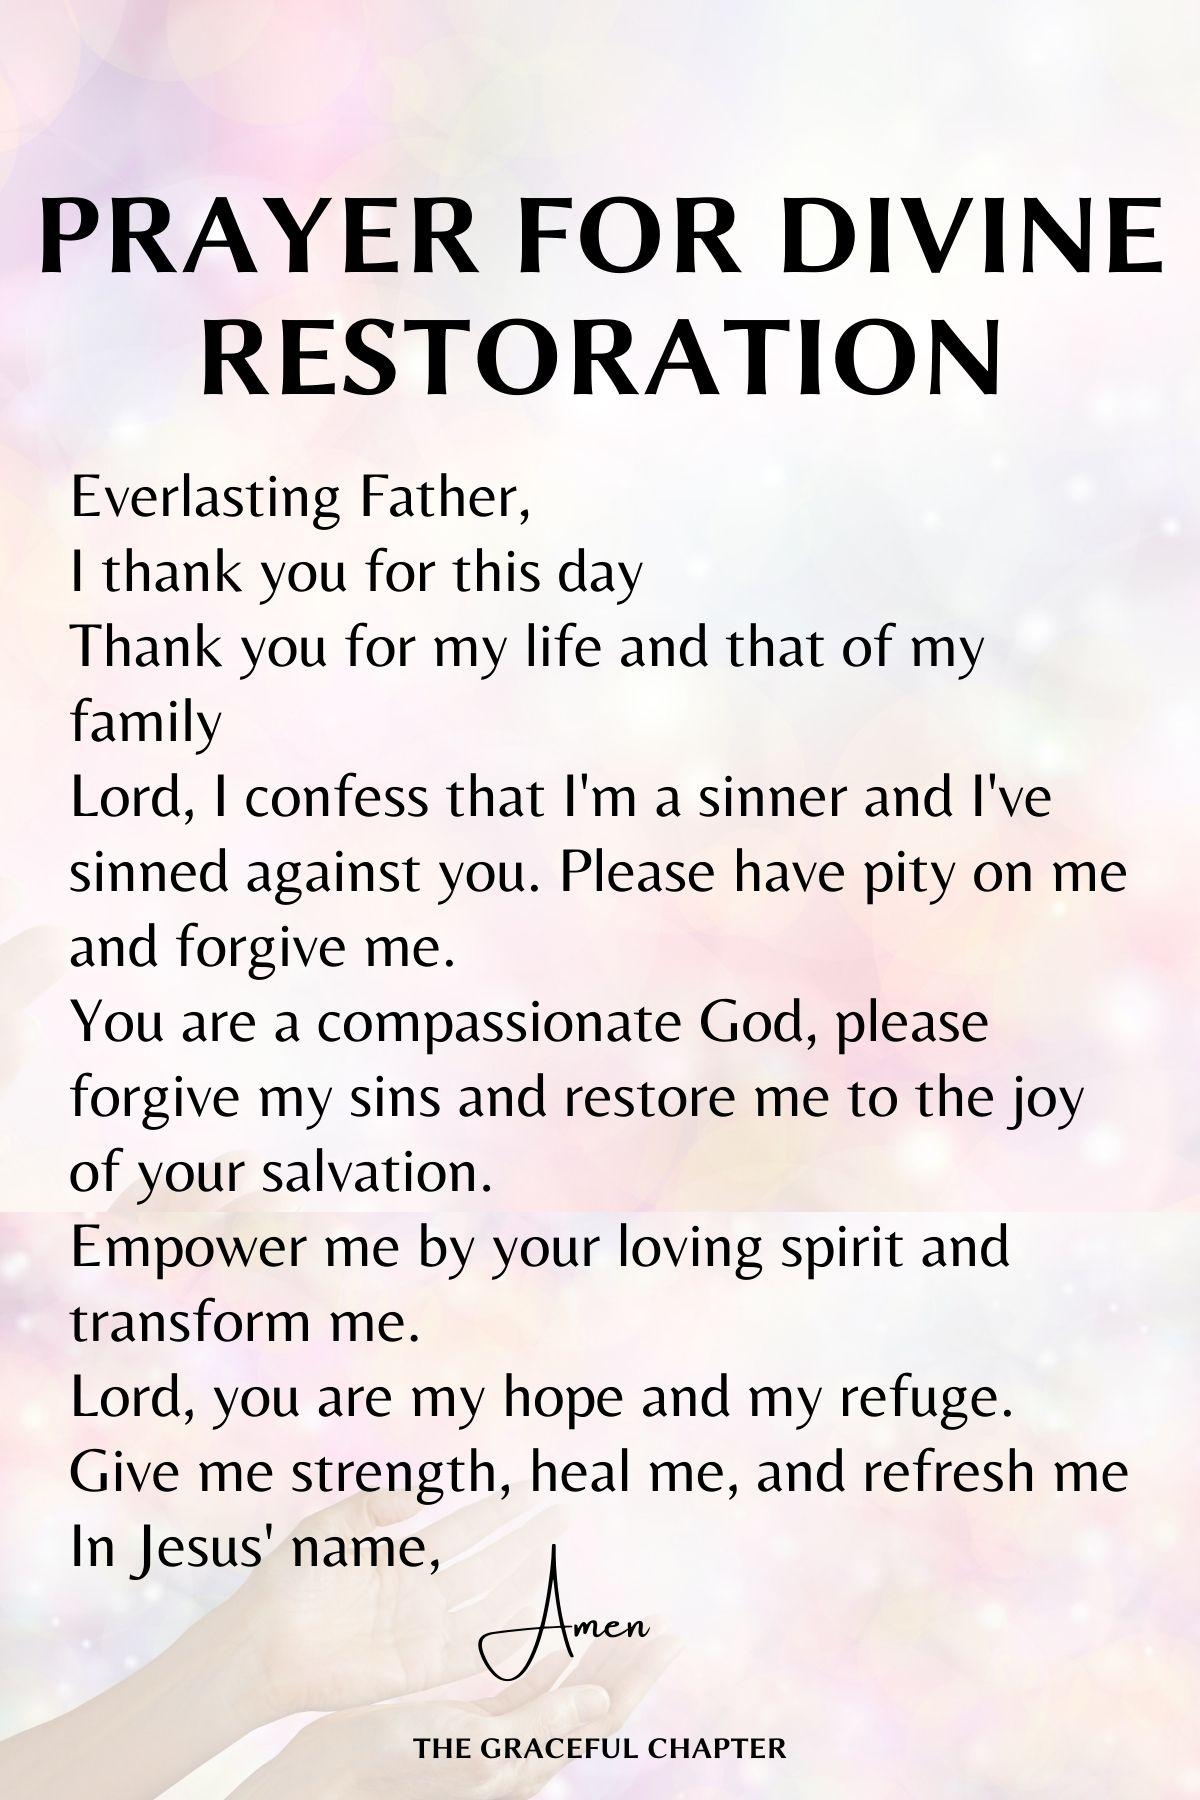 Prayer for divine restoration - Prayers for healing